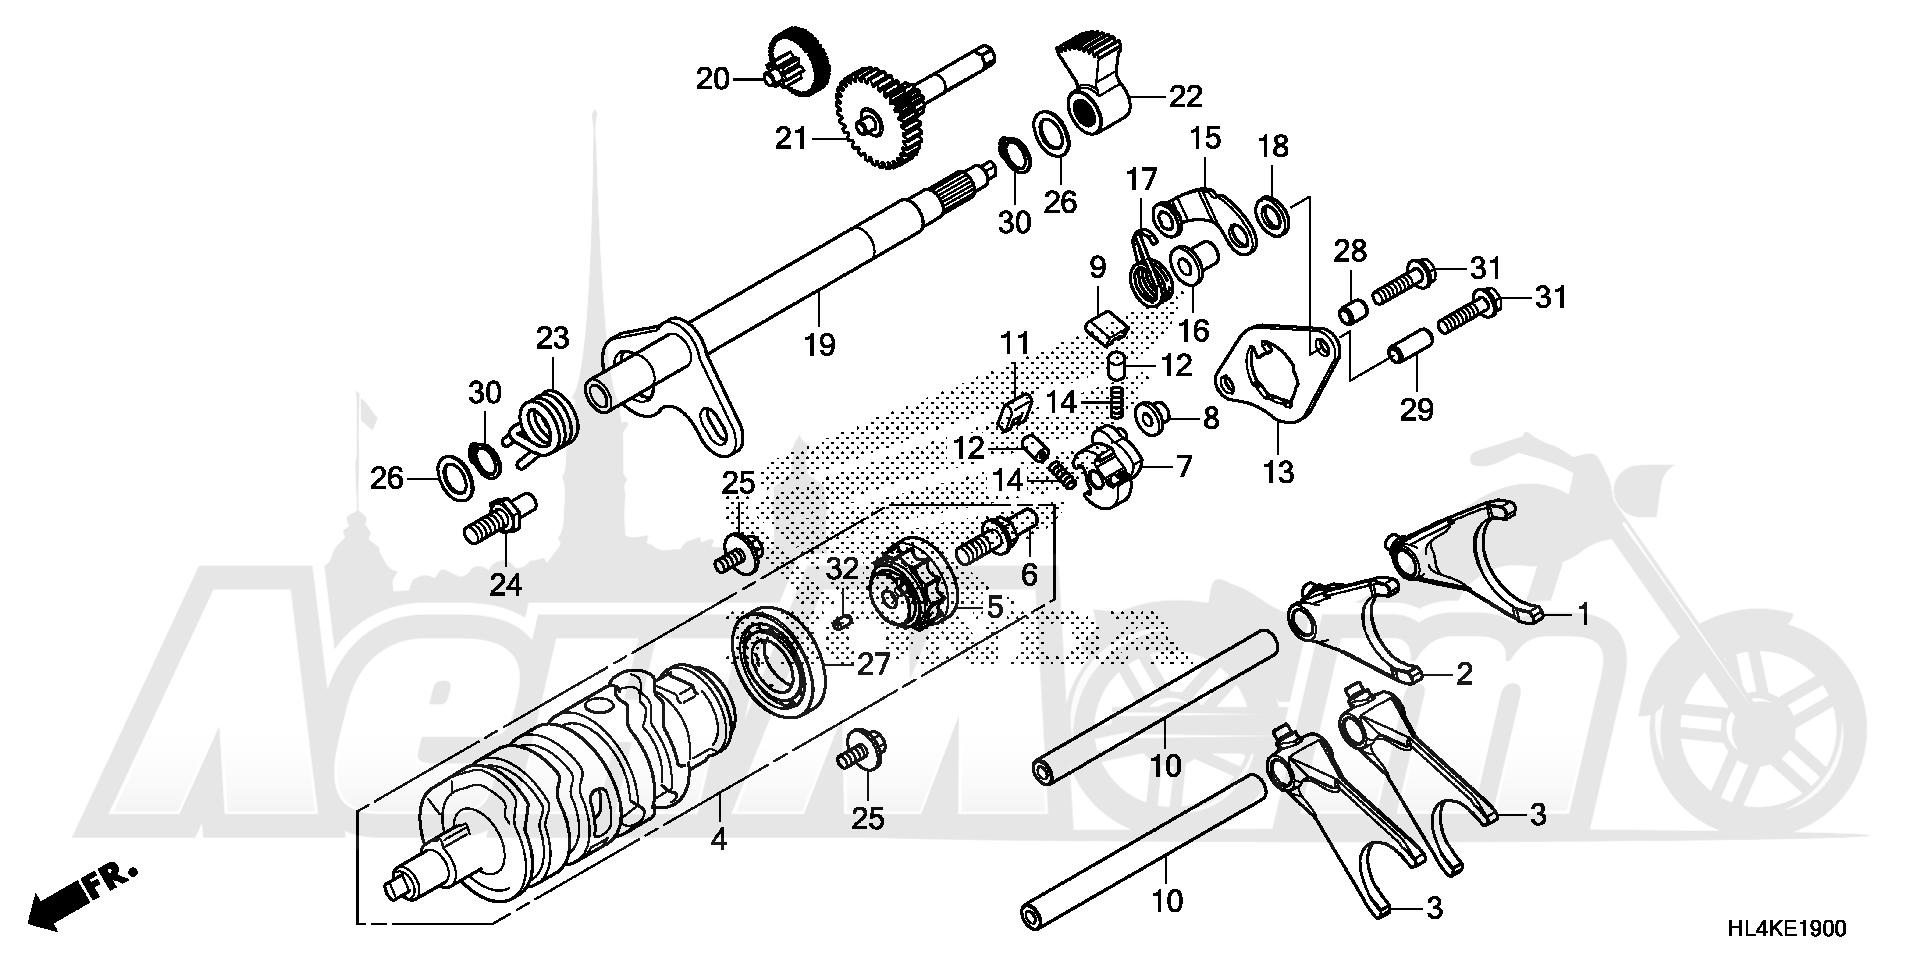 Запчасти для Квадроцикла Honda 2019 SXS1000M5L Раздел: GEARSHIFT FORK | переключение передач вилка